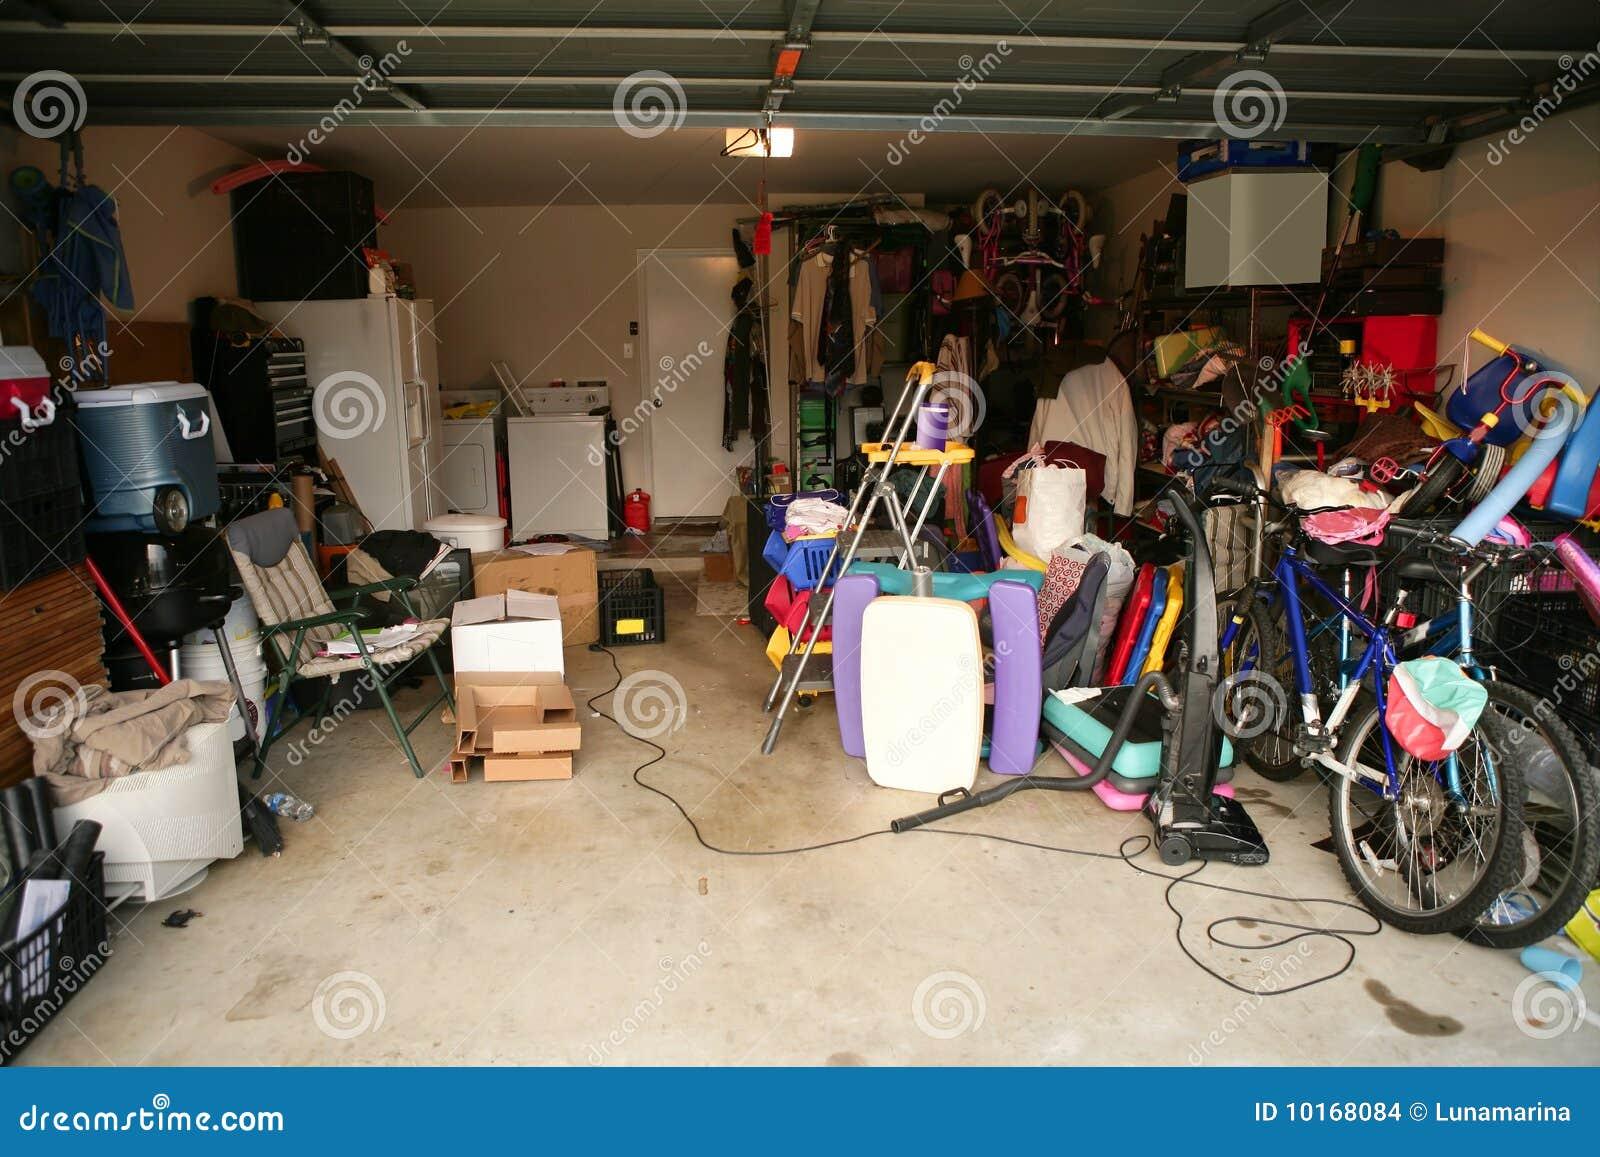 Messy Abandoned Garage Full Of Stuff Stock Images Image